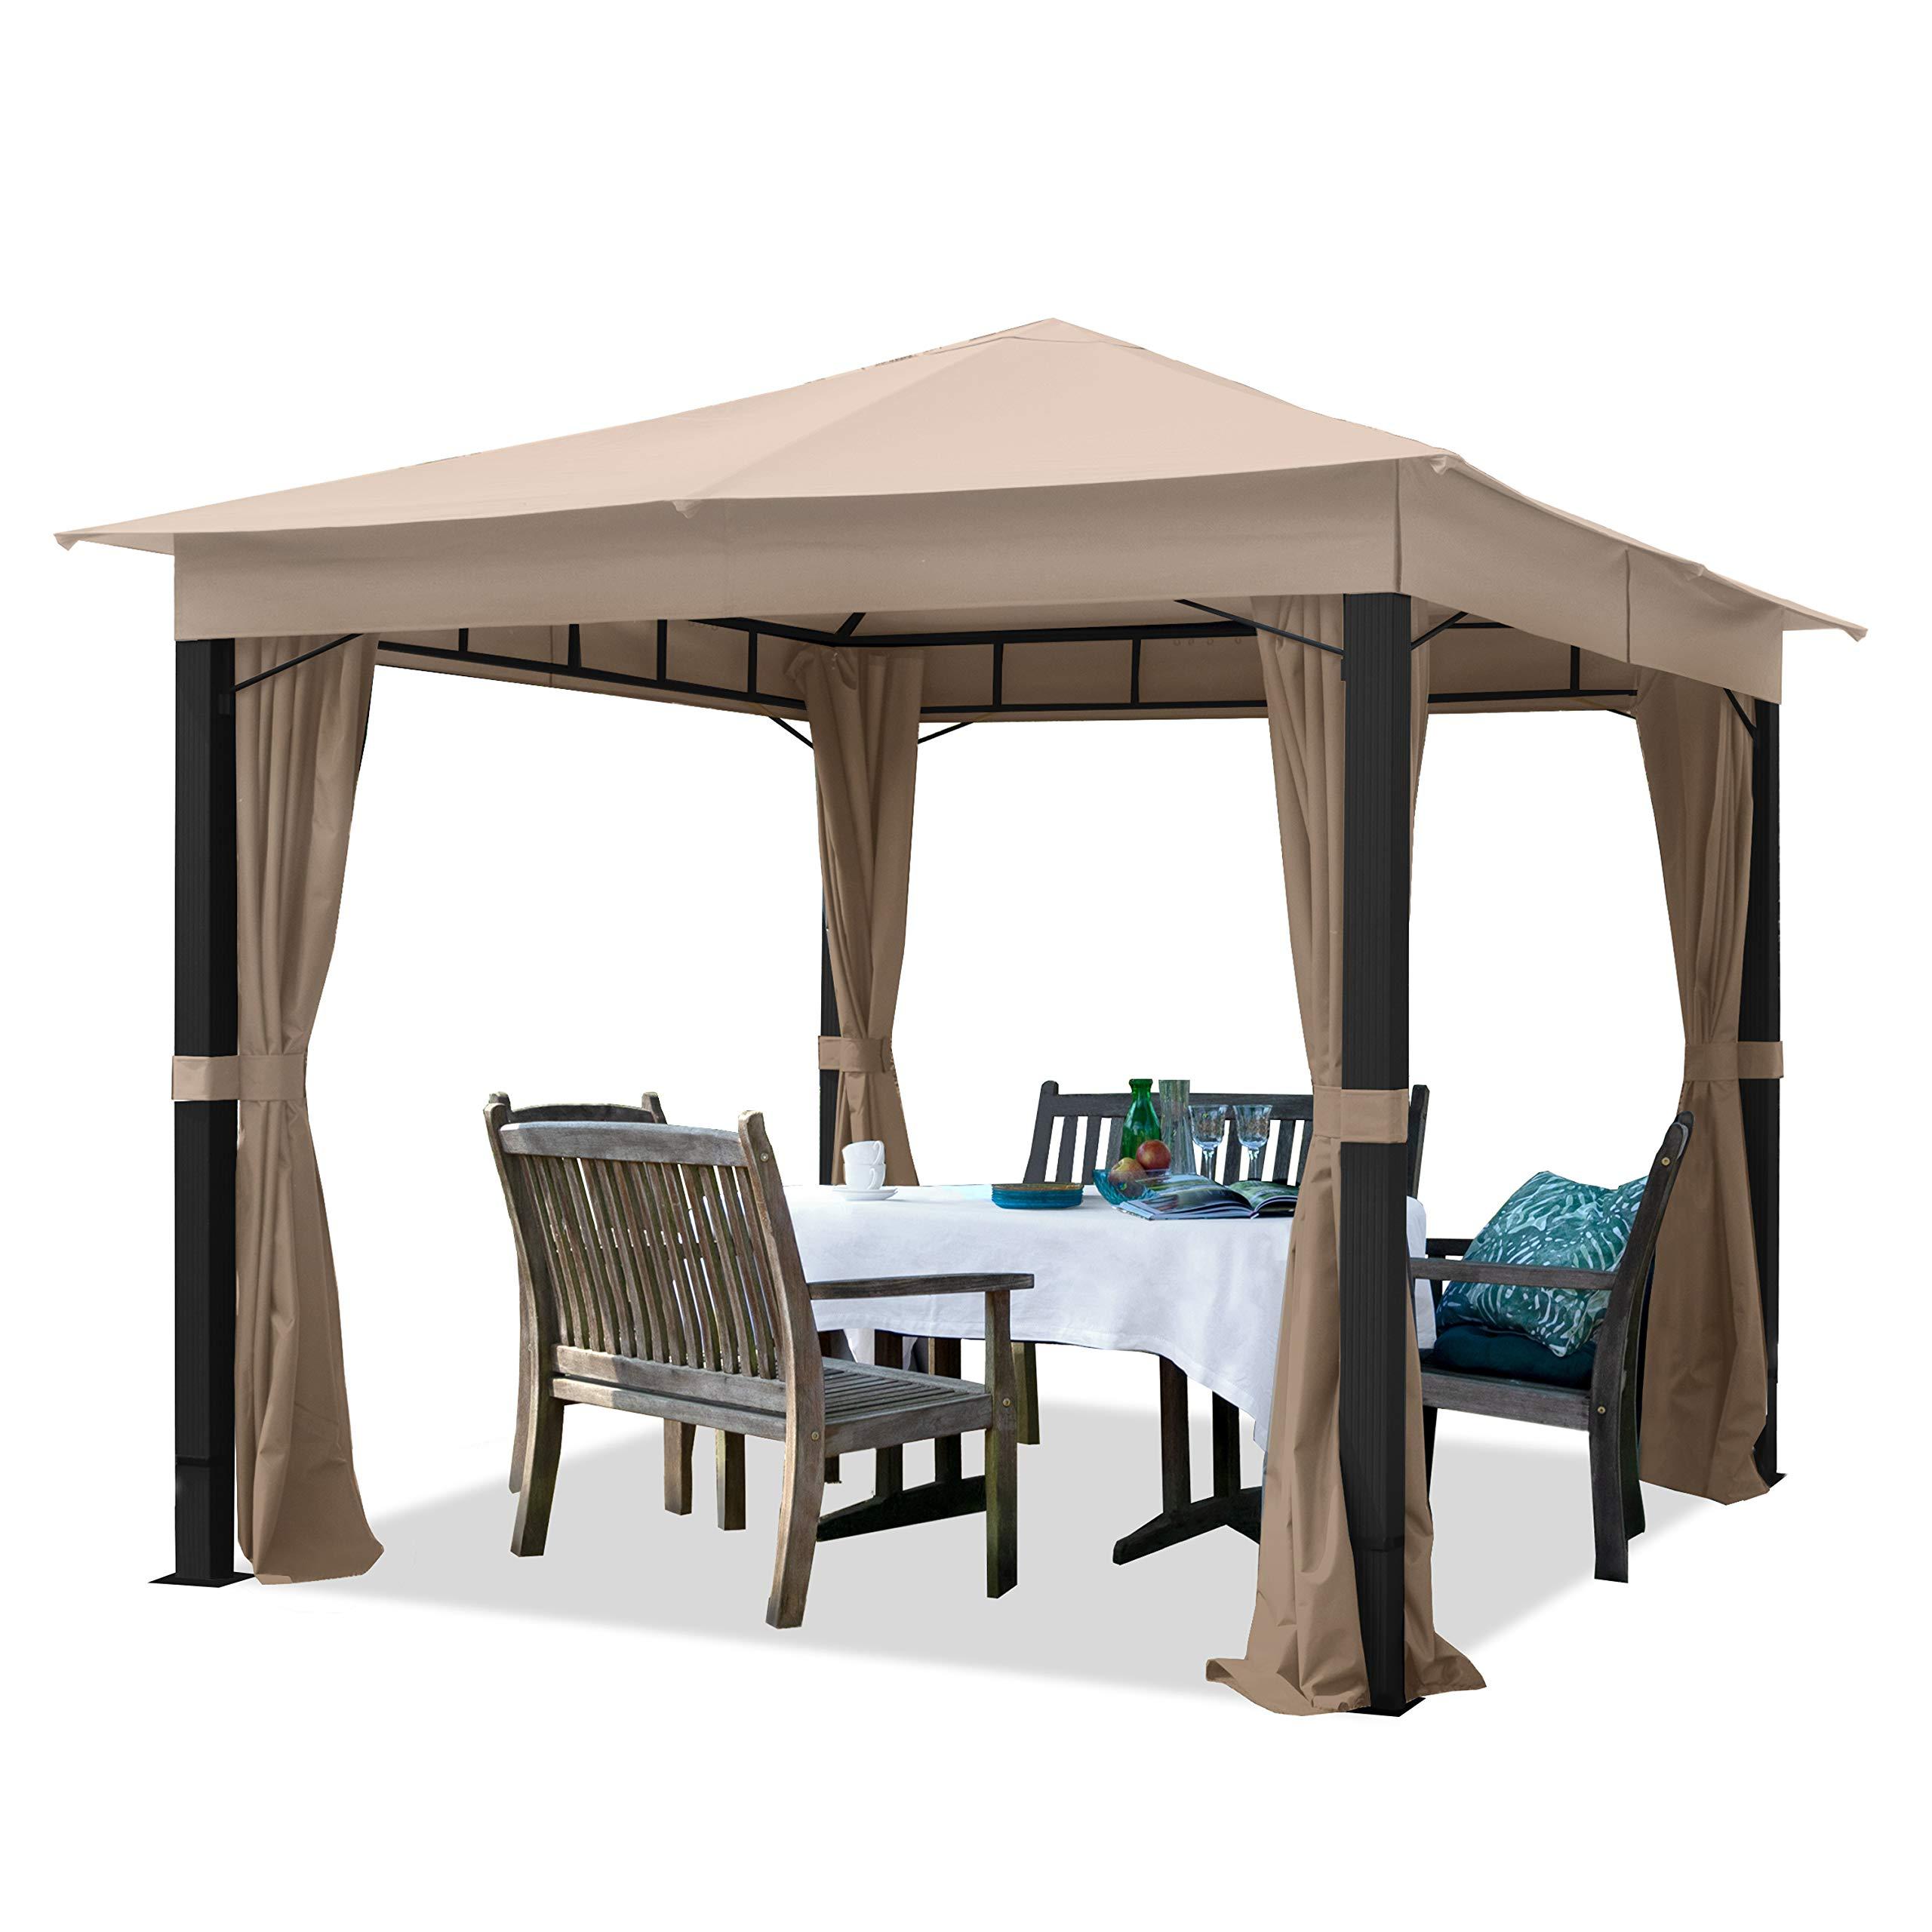 TOOLPORT Cenador de jardín 3x3m ALU Premium 280g/m² Lona de Techo ...